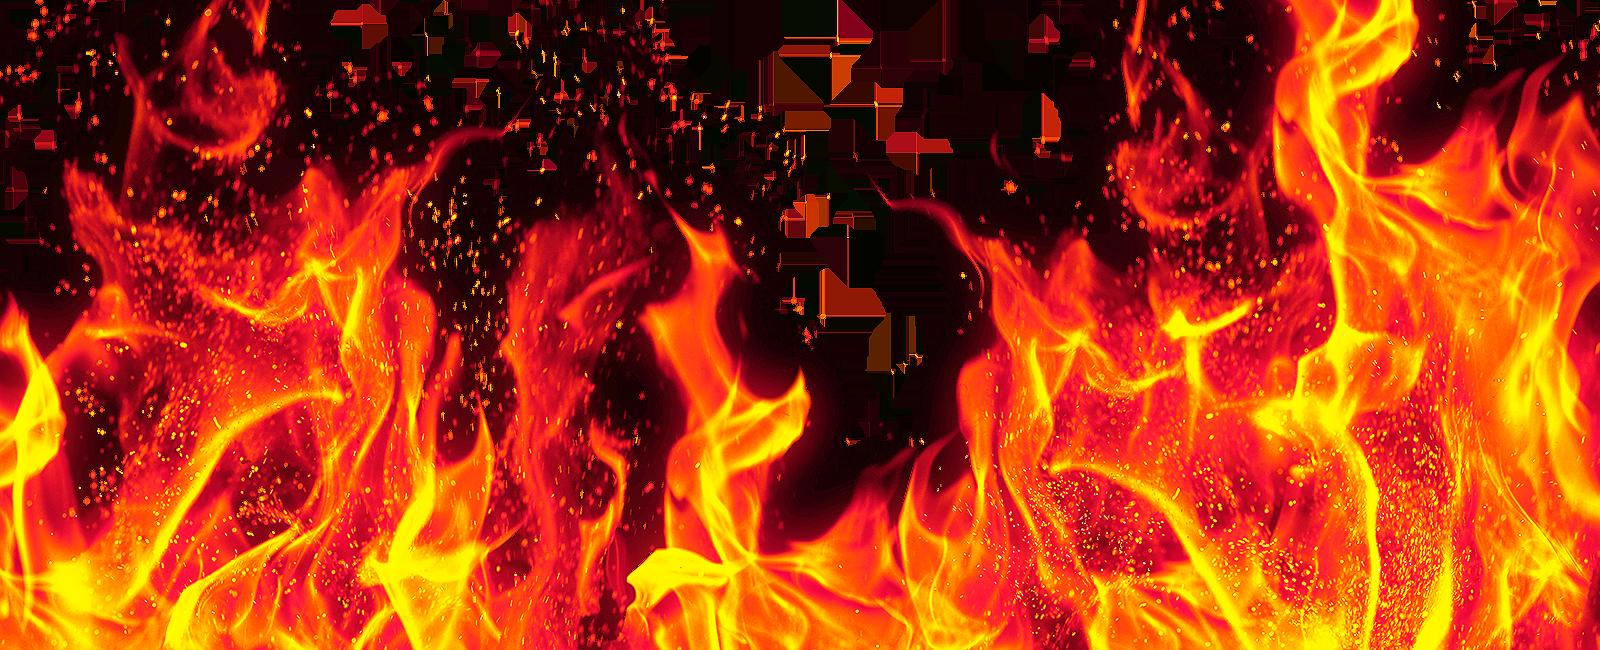 Burn PNG Transparent Image.